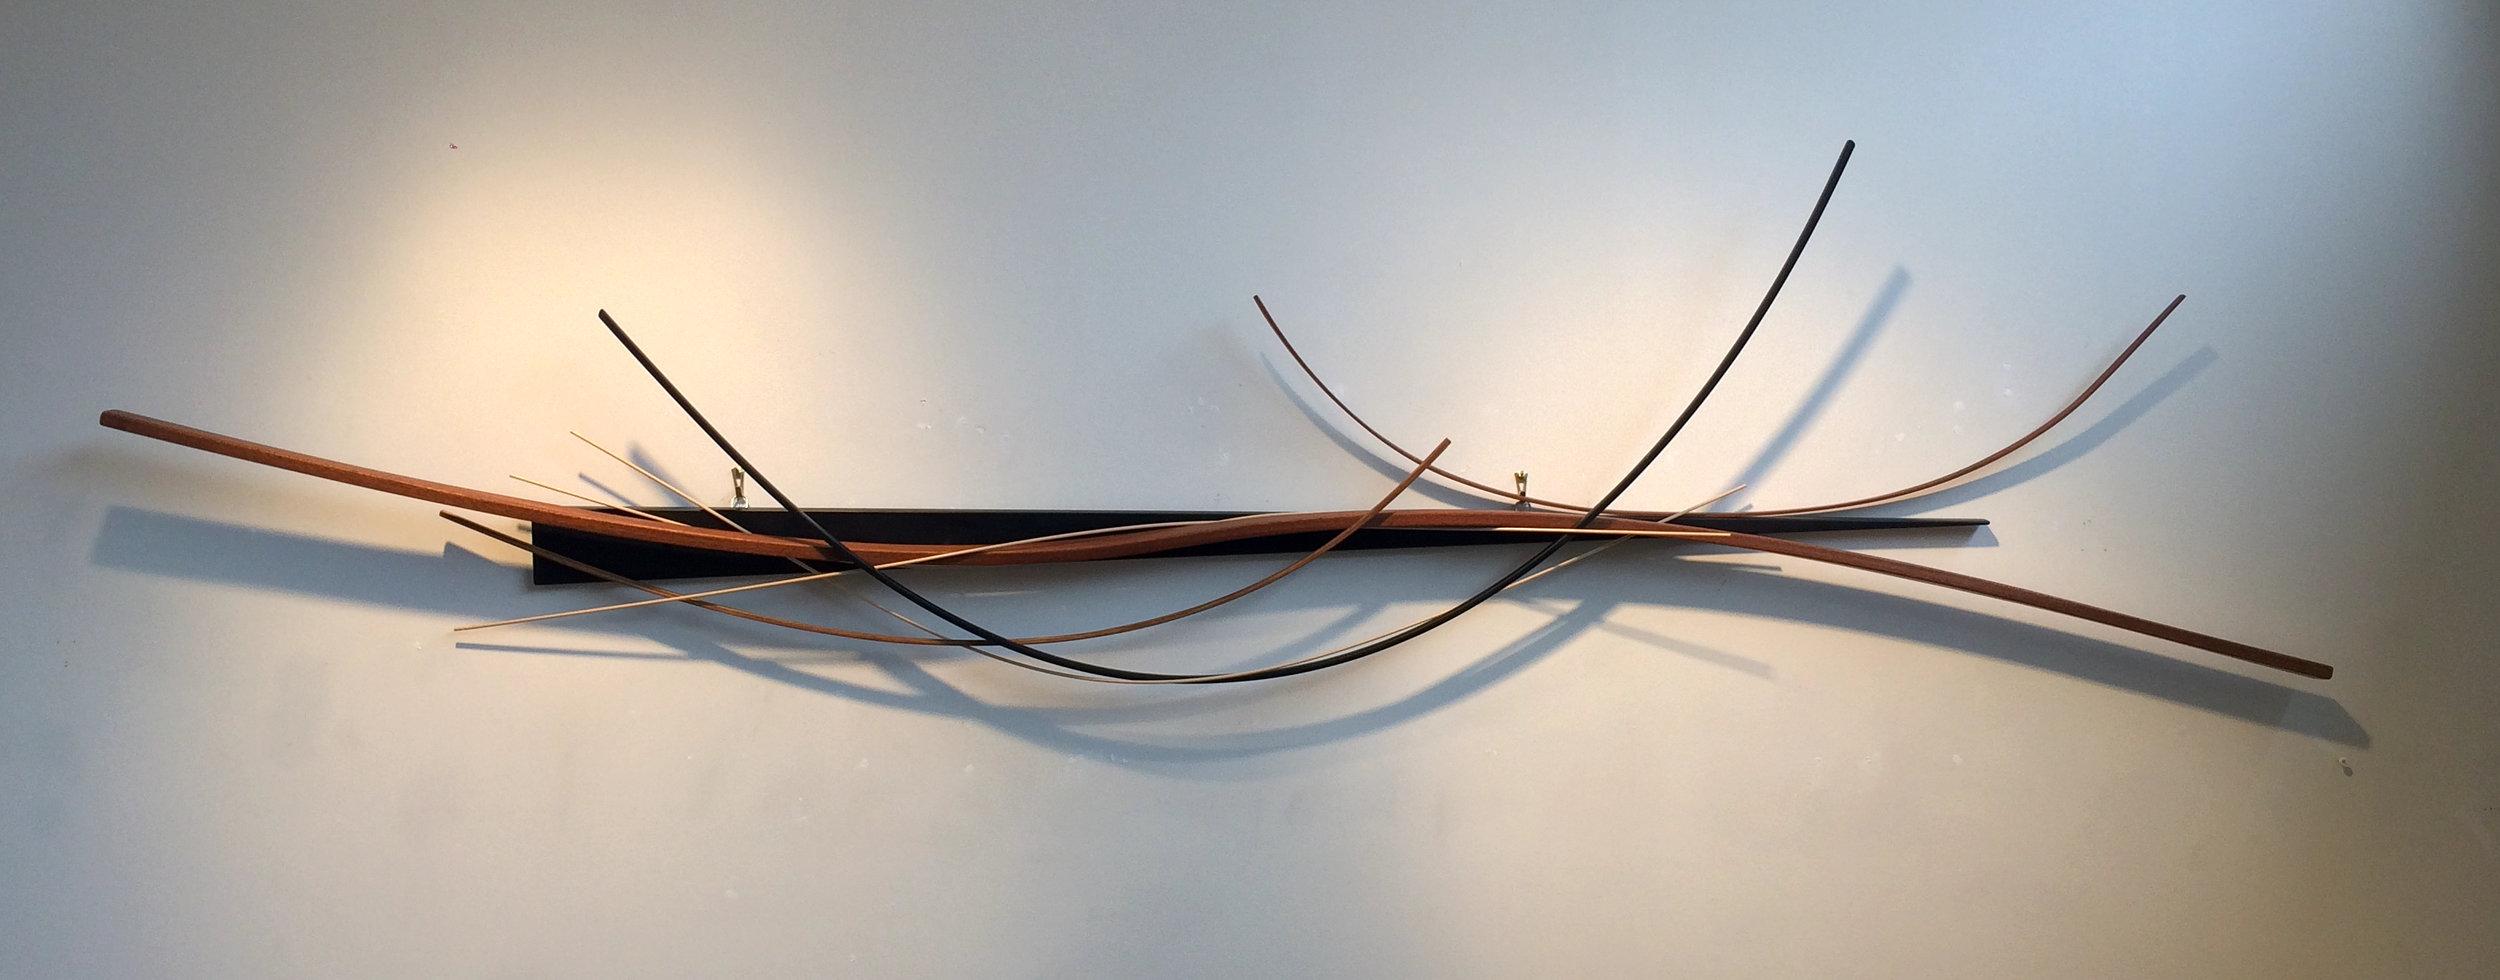 "John Schwartzkopf  (BIO) ,   Wedged Arc  , 2012, paperstone, mahogany, various woods,31 1/2"" x 82"" x 5"""